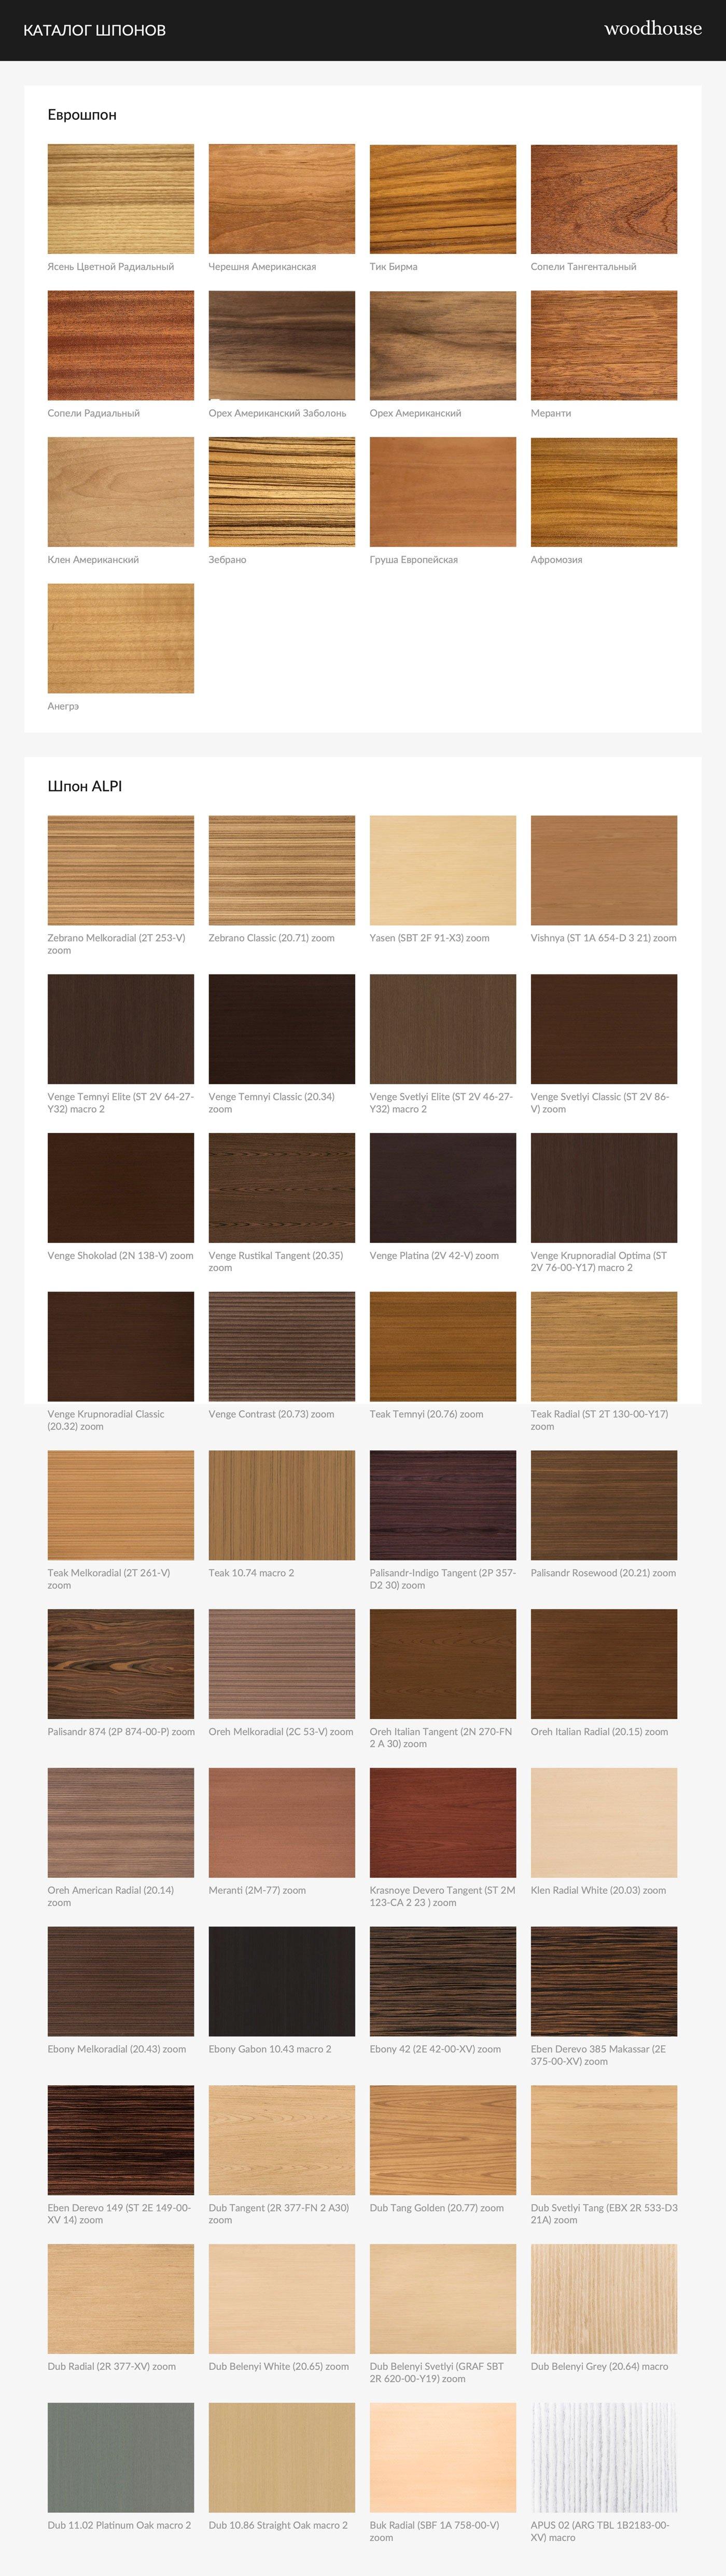 Варианты шпона и покраски дверей